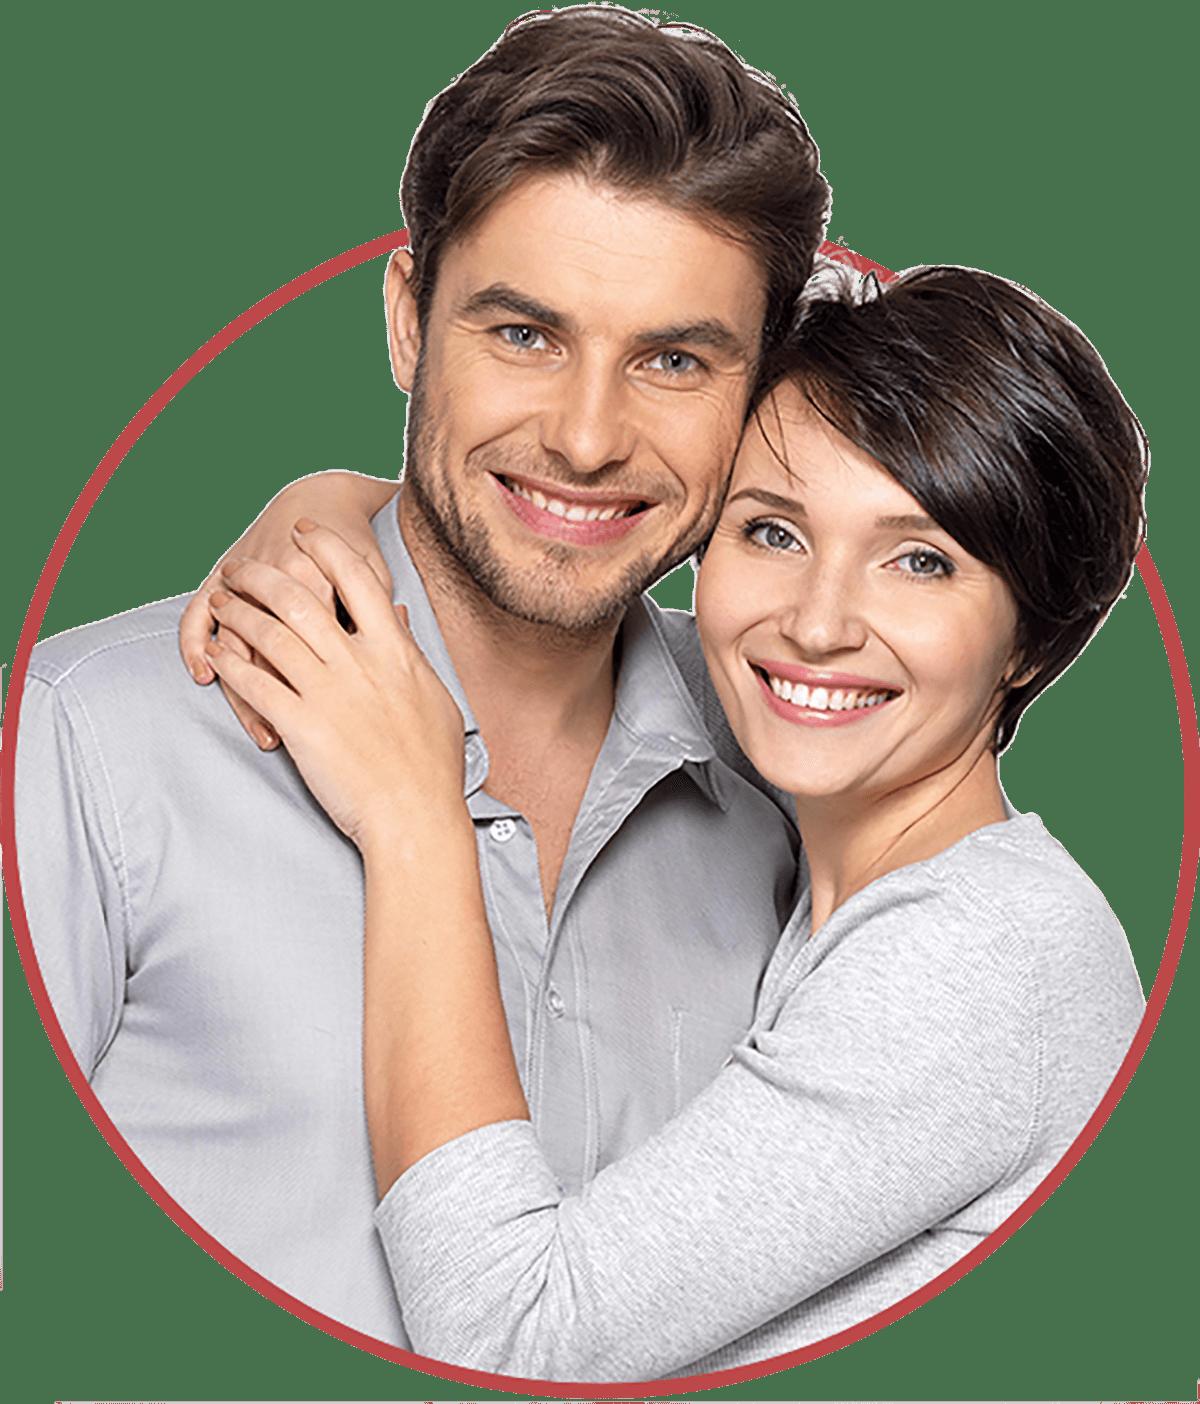 partnervermittlung gehobene ansprüche